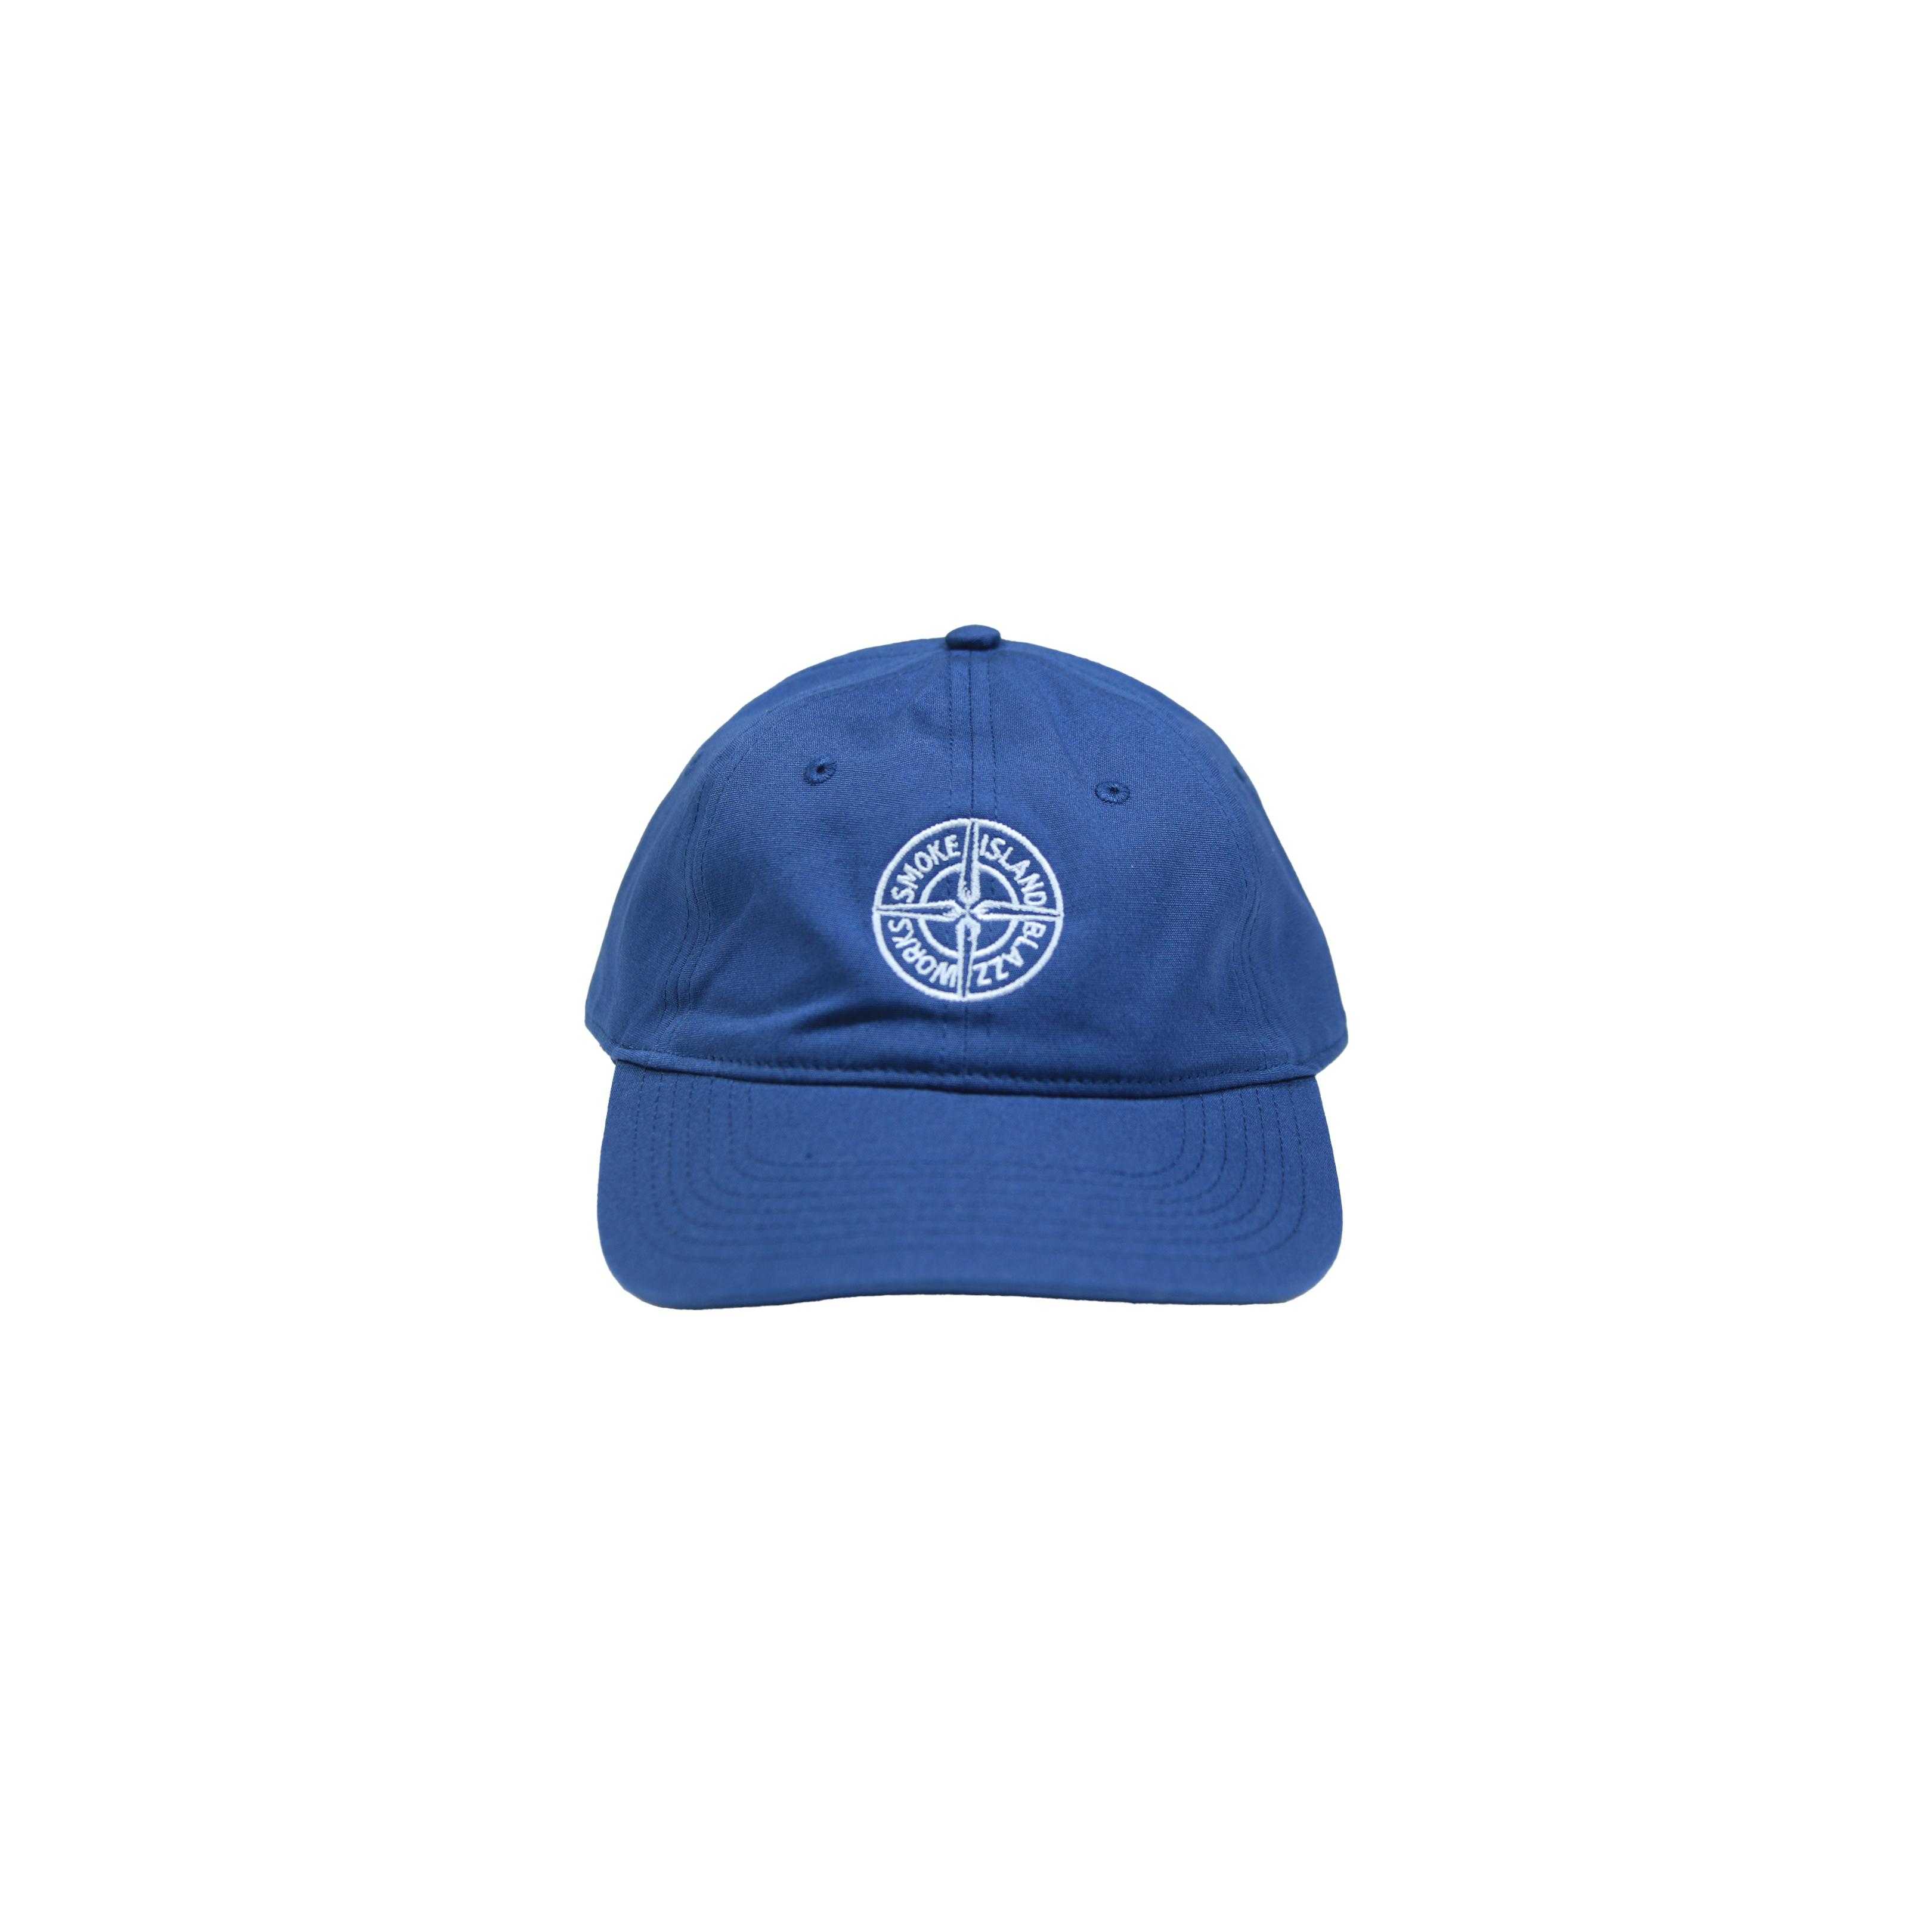 SMOKE ISLAND COTTON CAP [NAVY]